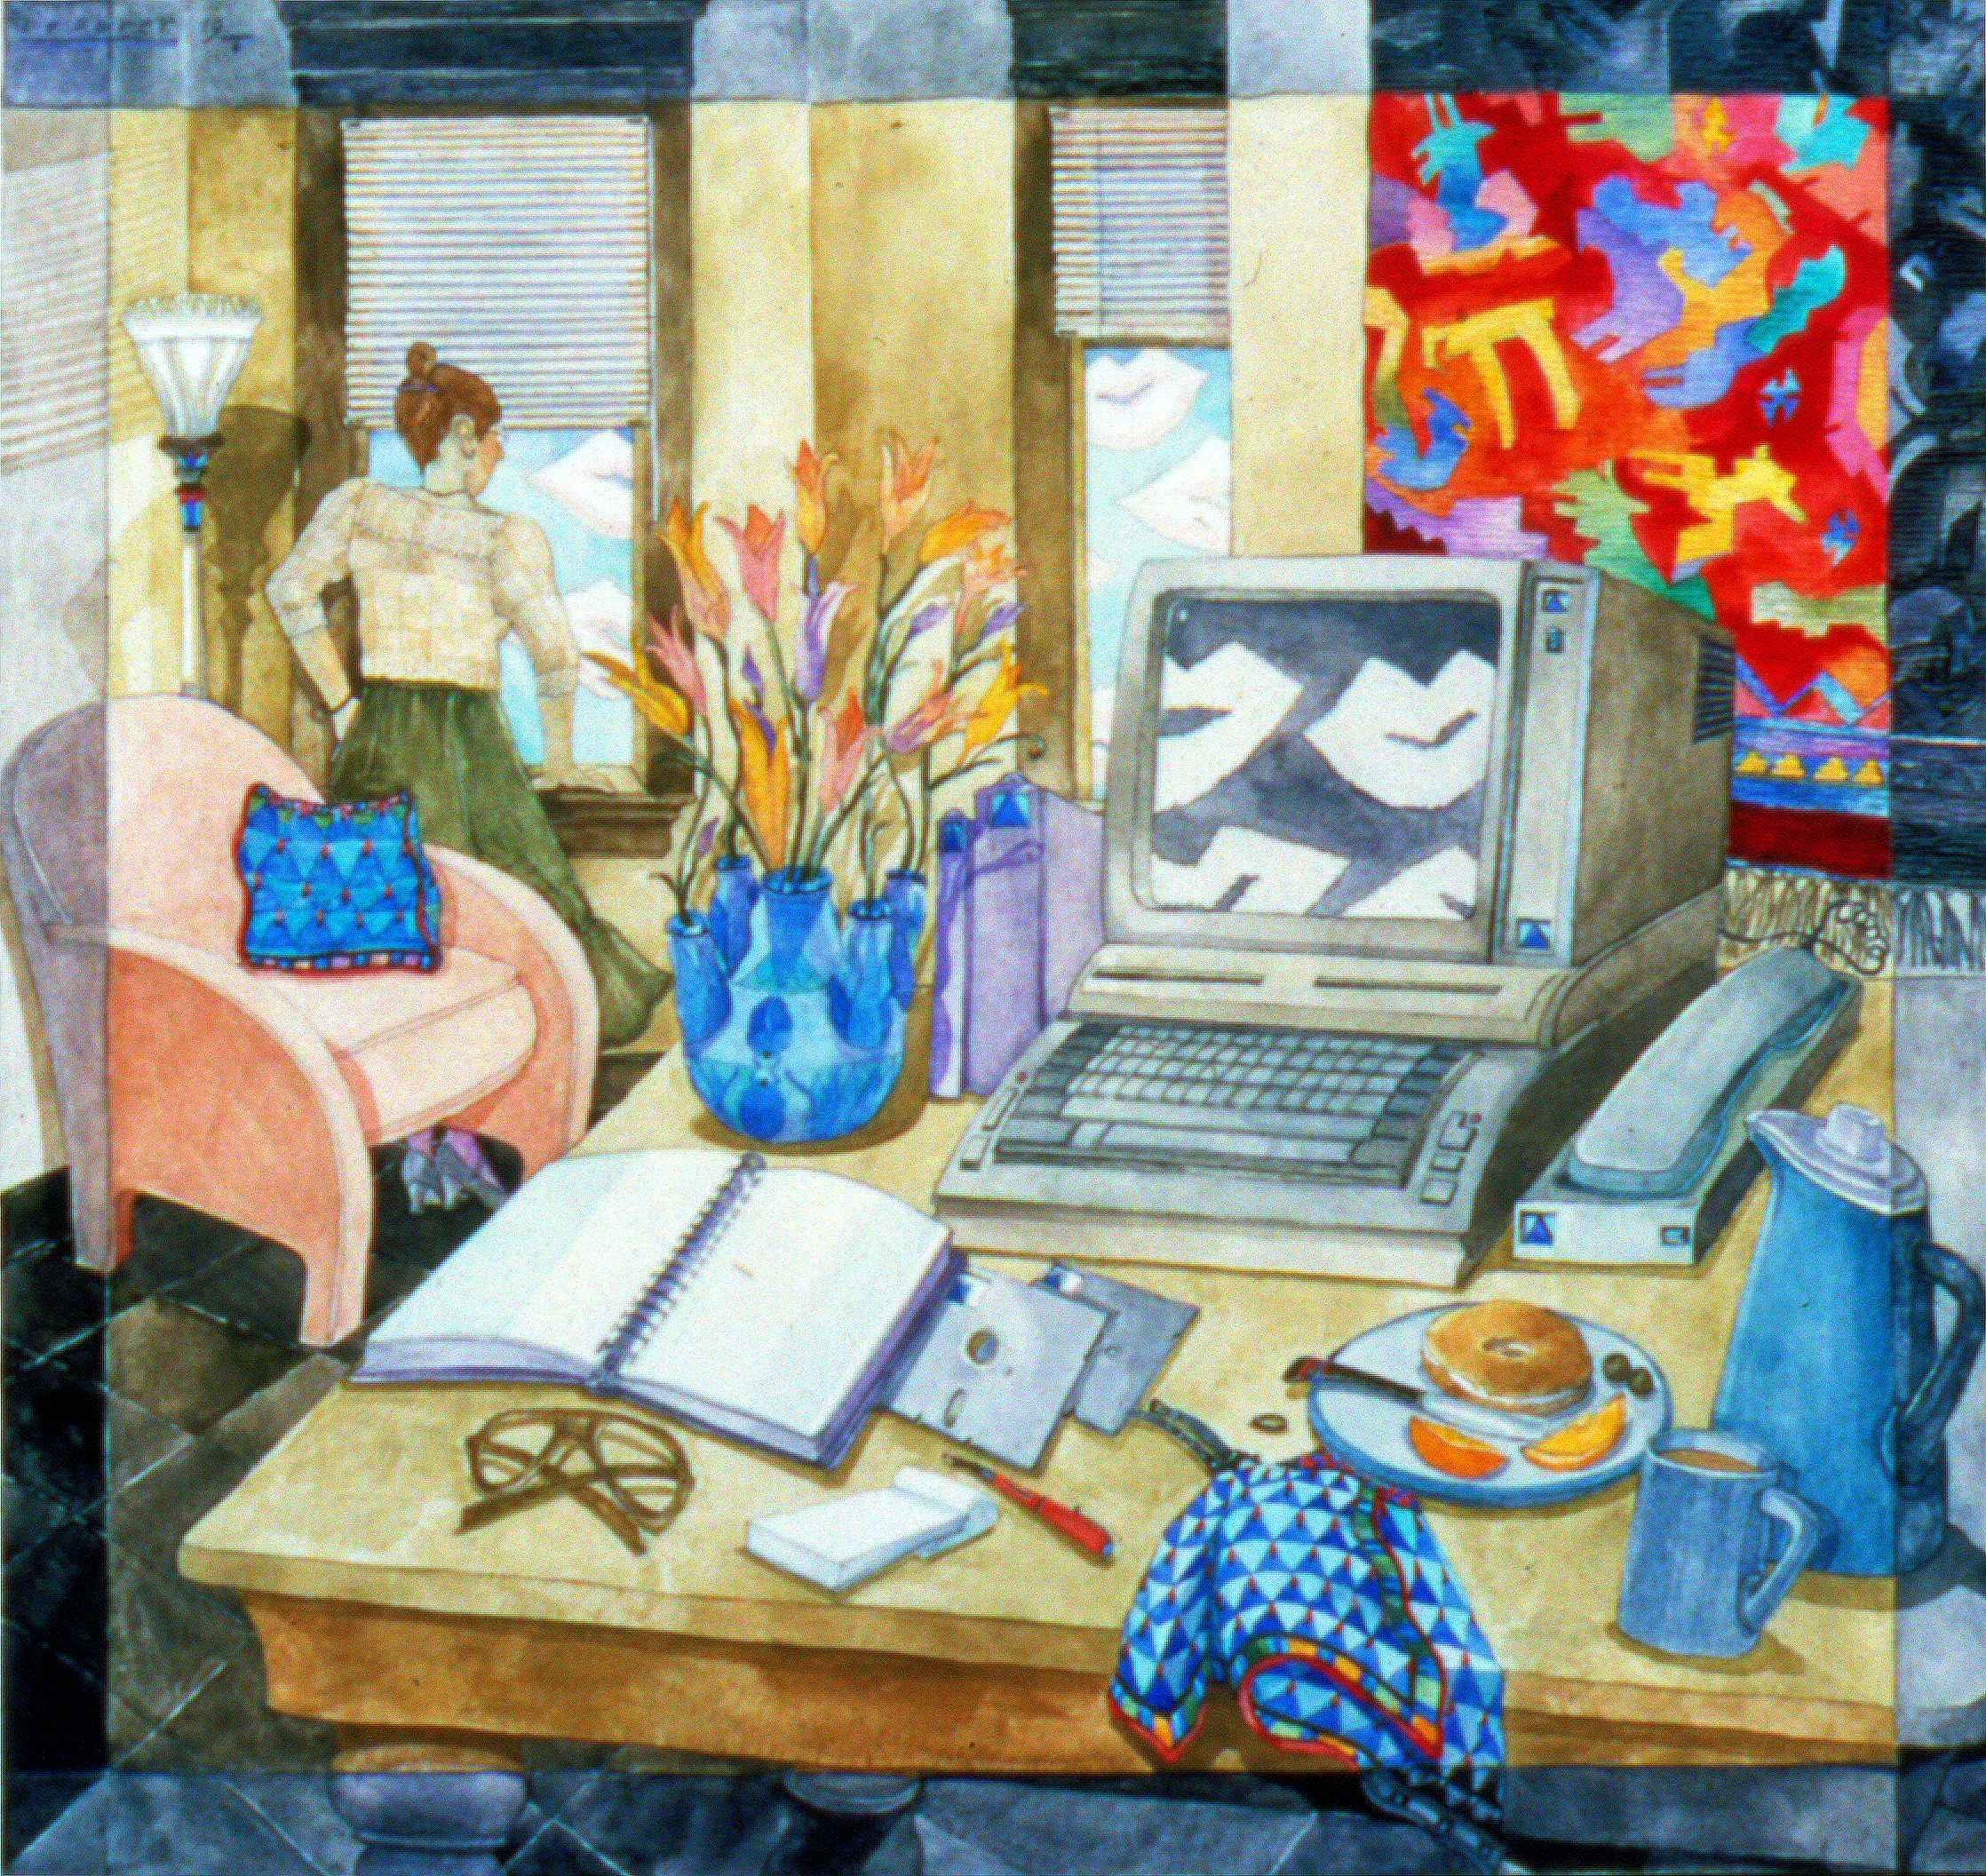 StillLifeWithComputer-1984.jpg